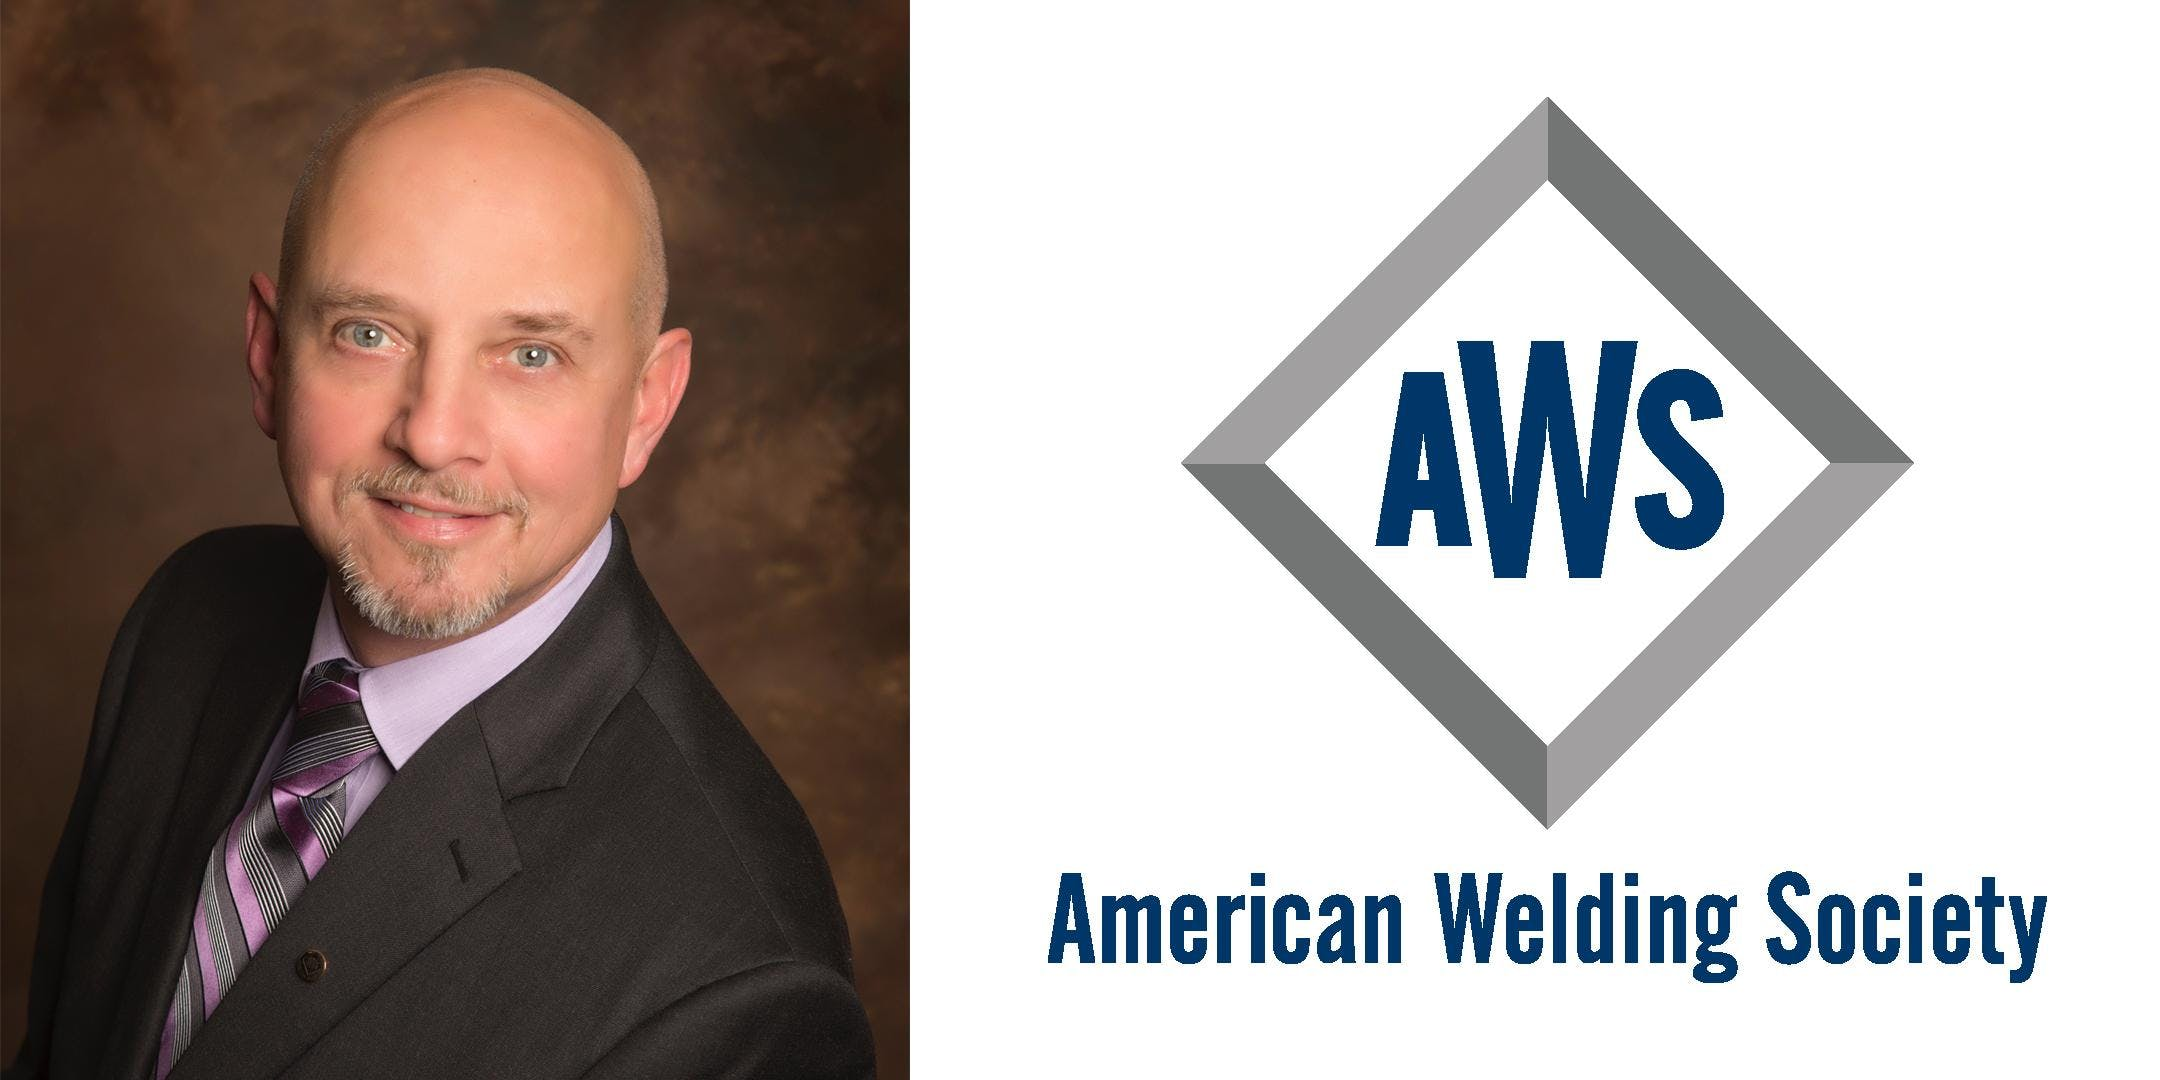 AWS President Visit 9/26: Dale Flood